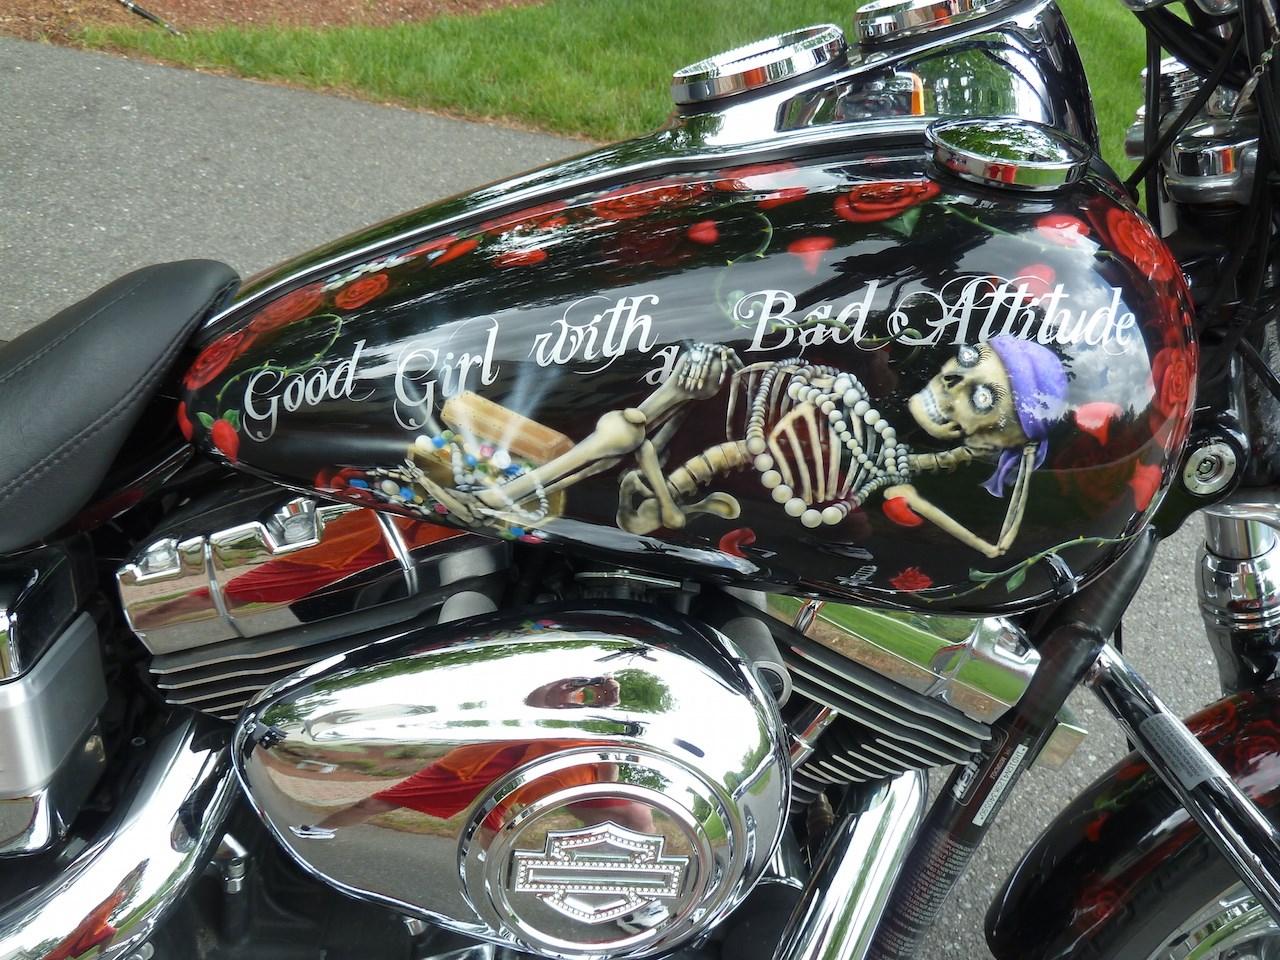 2009 Harley Davidson 174 Fxdl Dyna 174 Low Rider 174 Custom